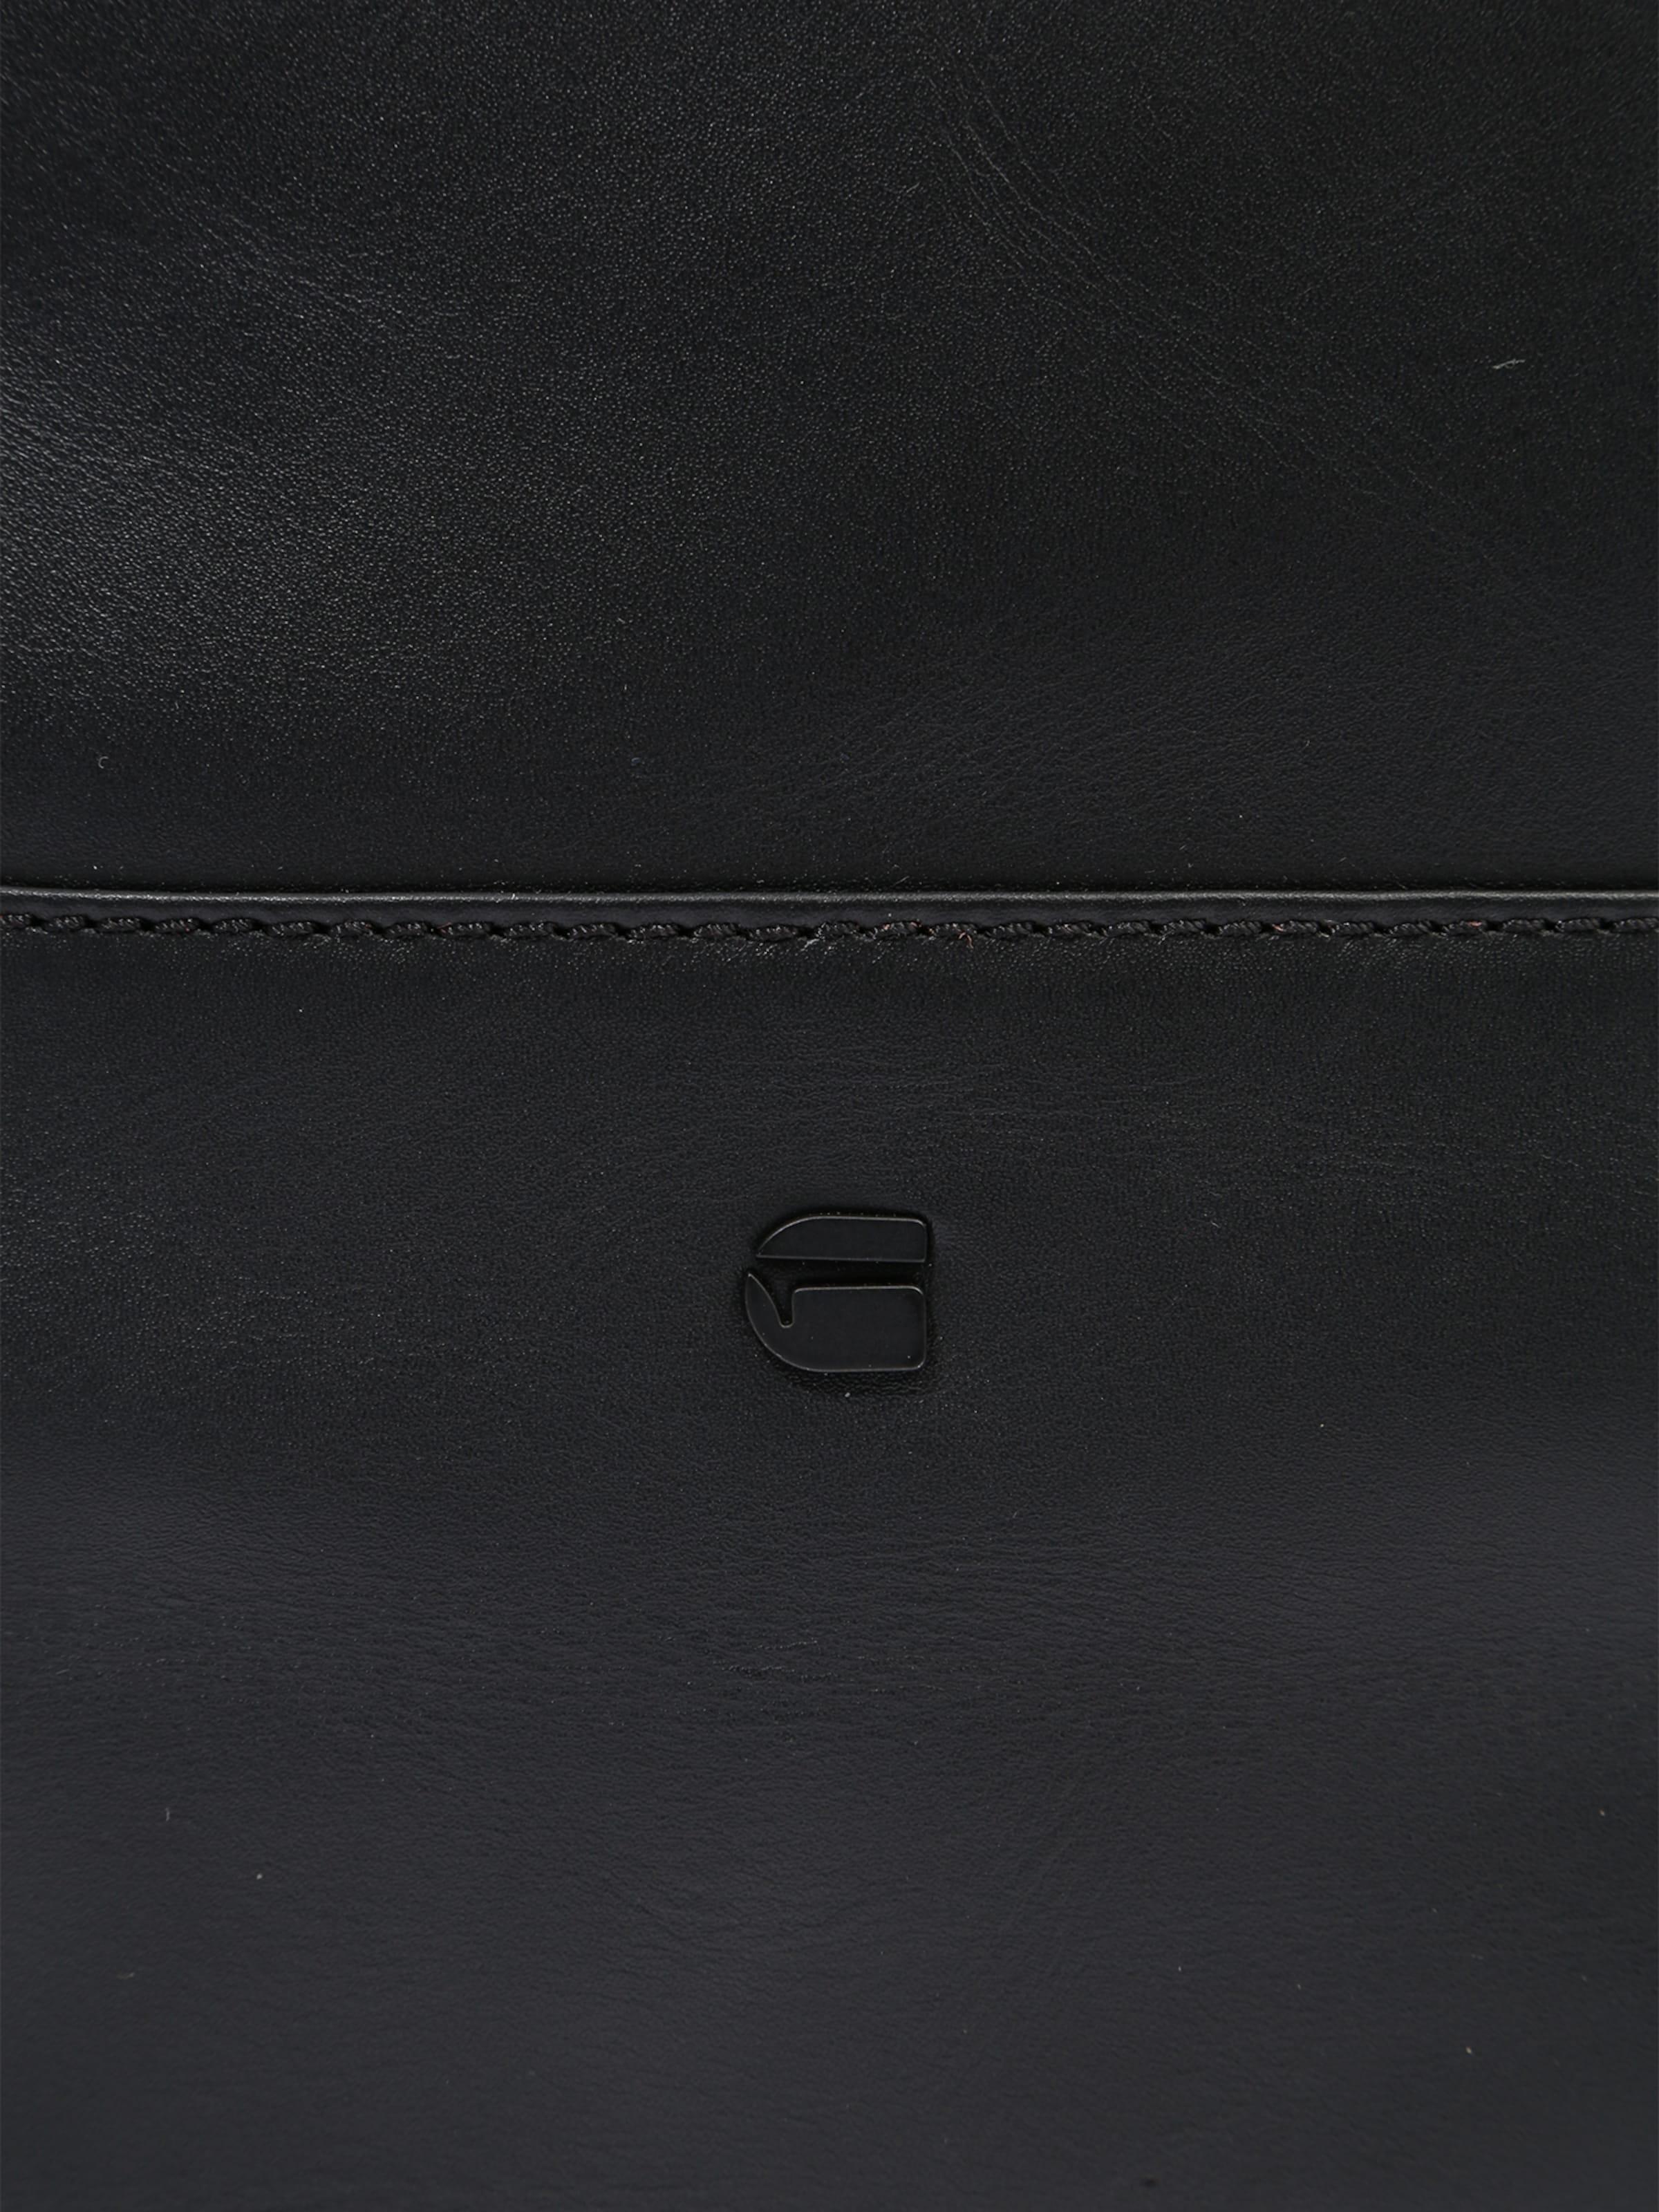 G Rucksack backpack' STAR RAW RAW STAR RAW Rucksack leather G STAR leather 'Mozoe backpack' G 'Mozoe qtAF7F